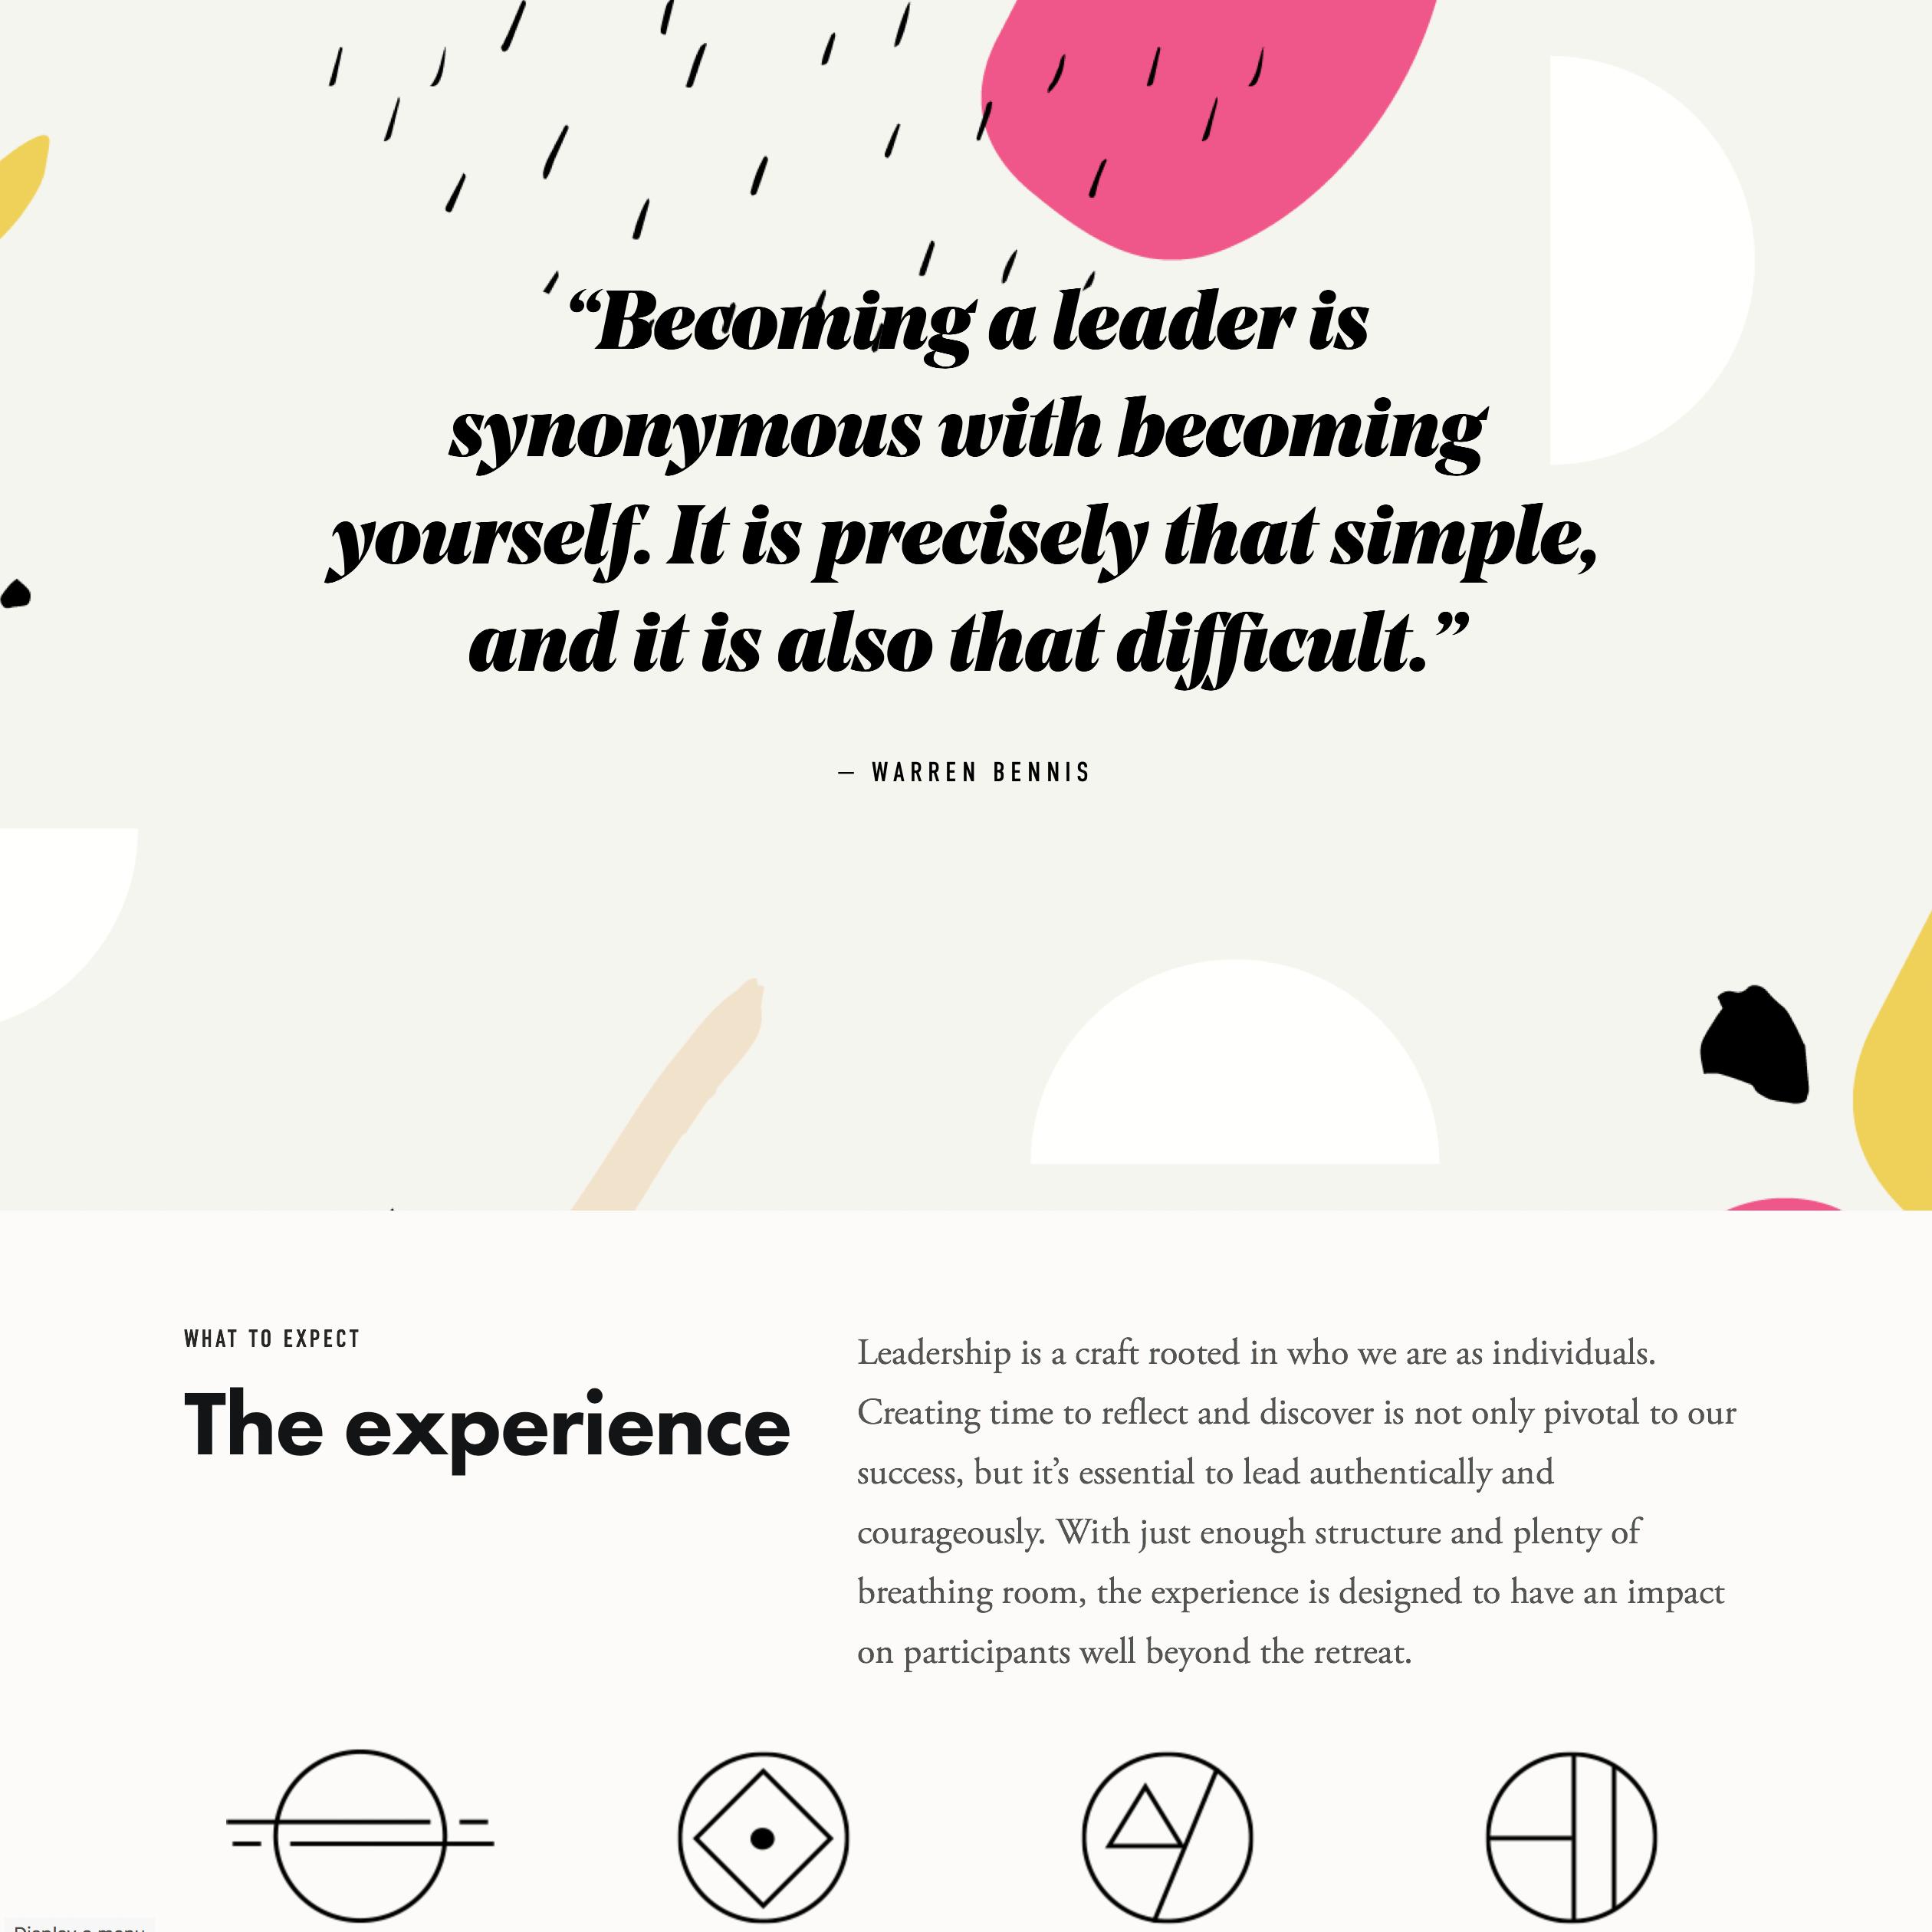 Fonts Used: Noe Display, Futura, Garamond, and DIN